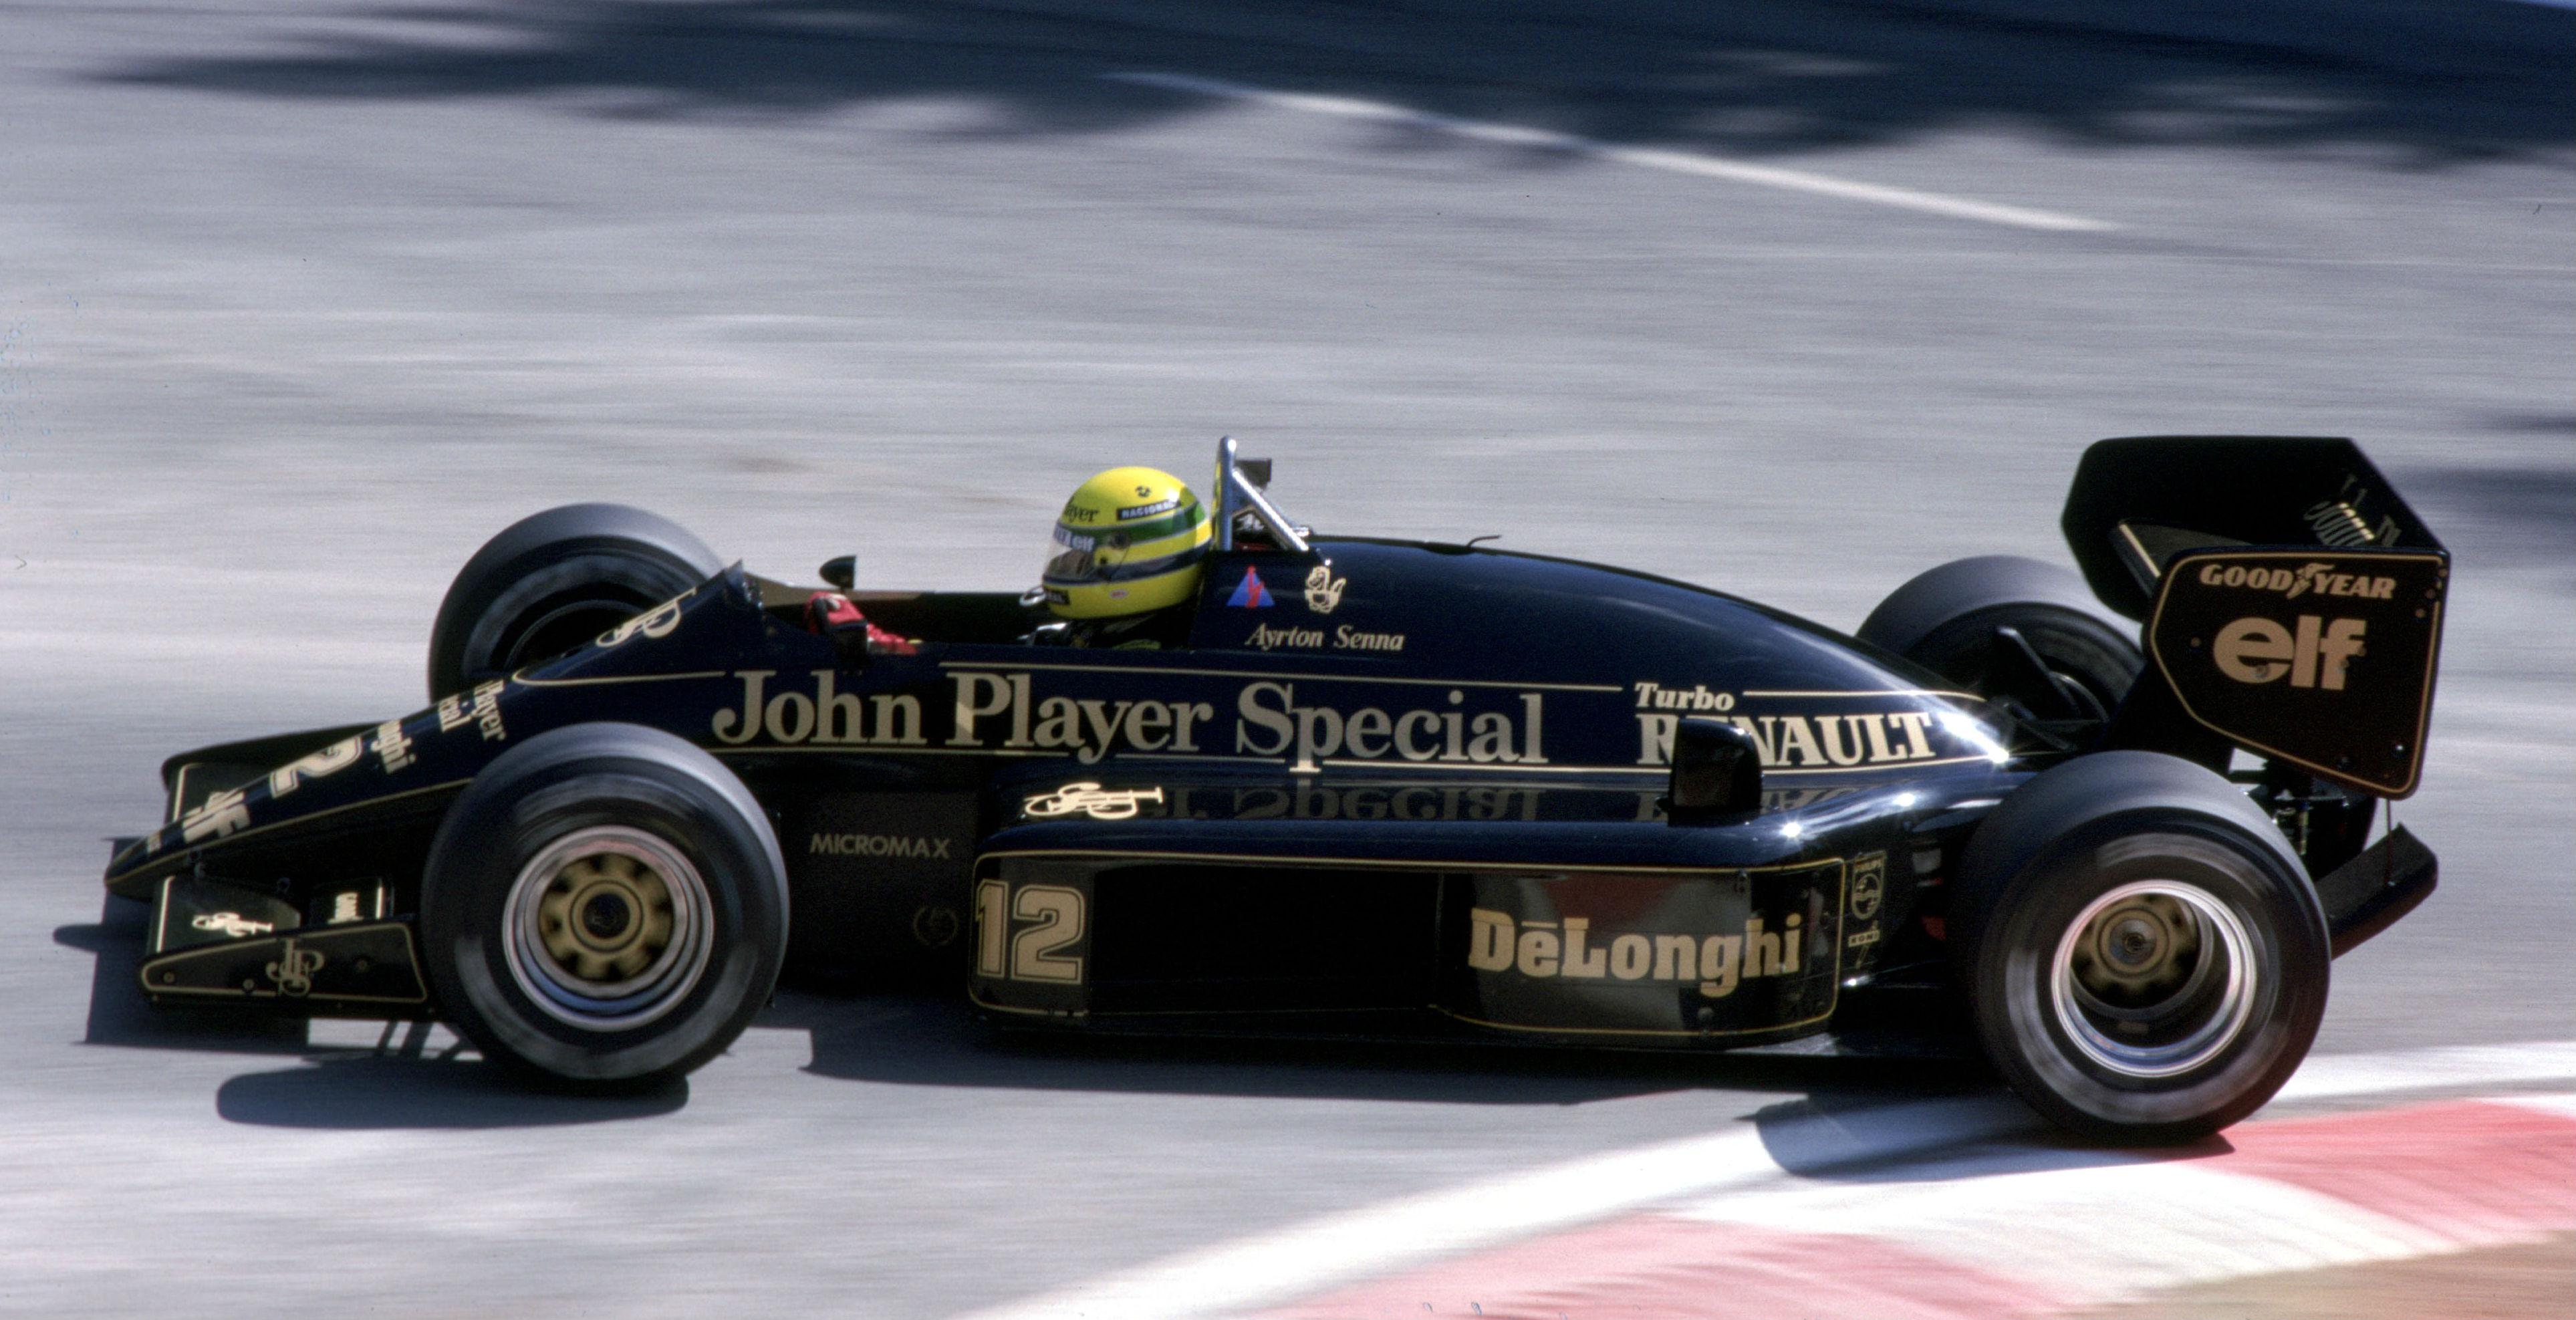 Ayrton Senna (Reuters - Action Images)